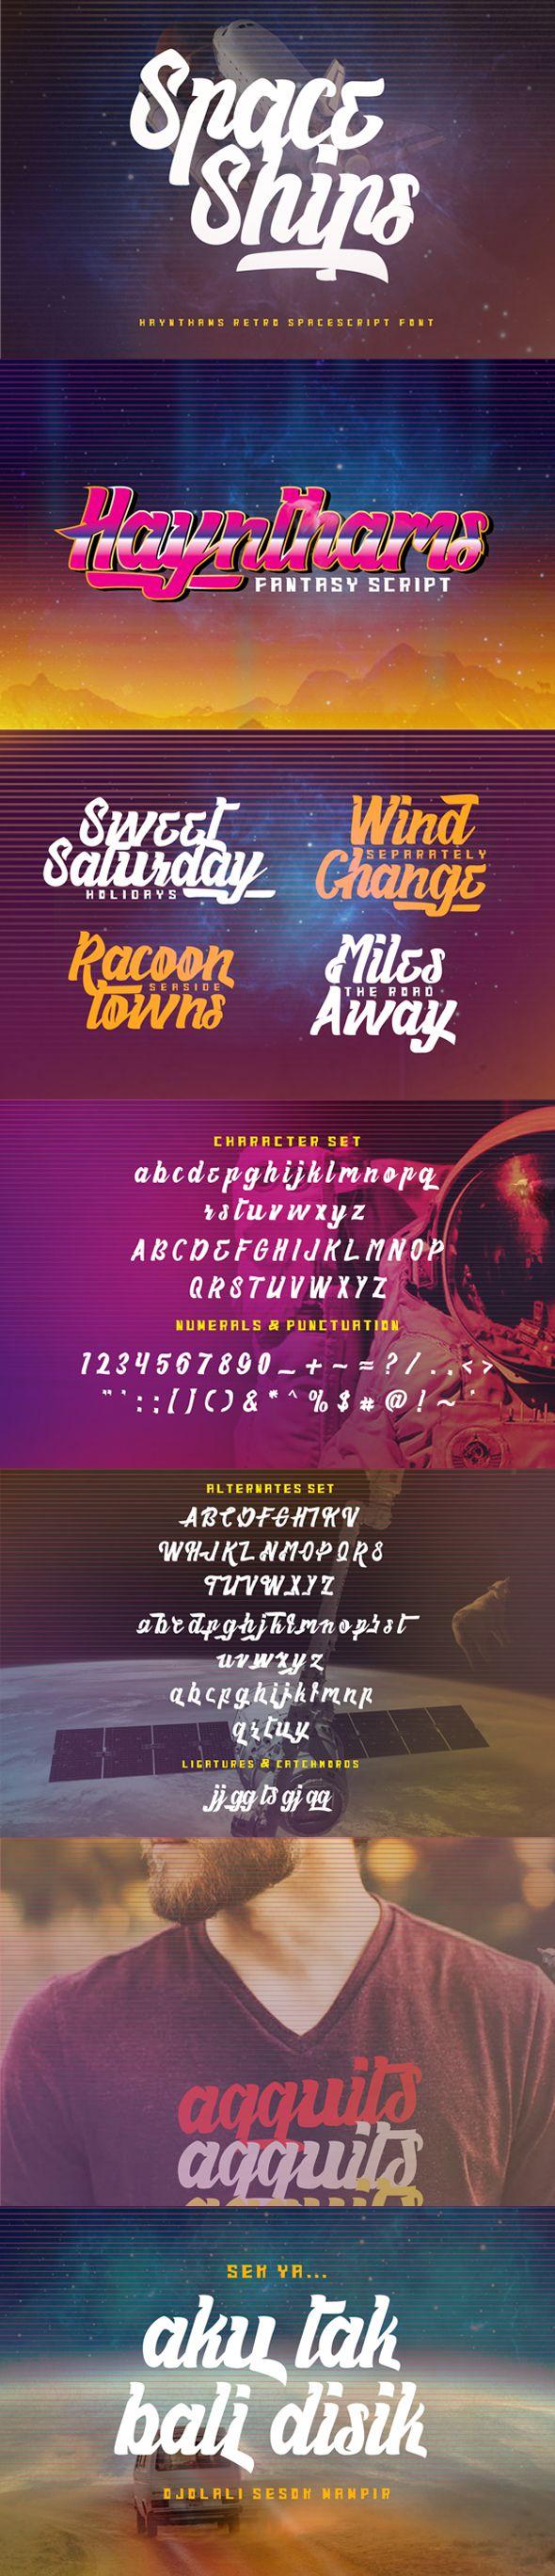 Haynthams Spacescript by Ovoz